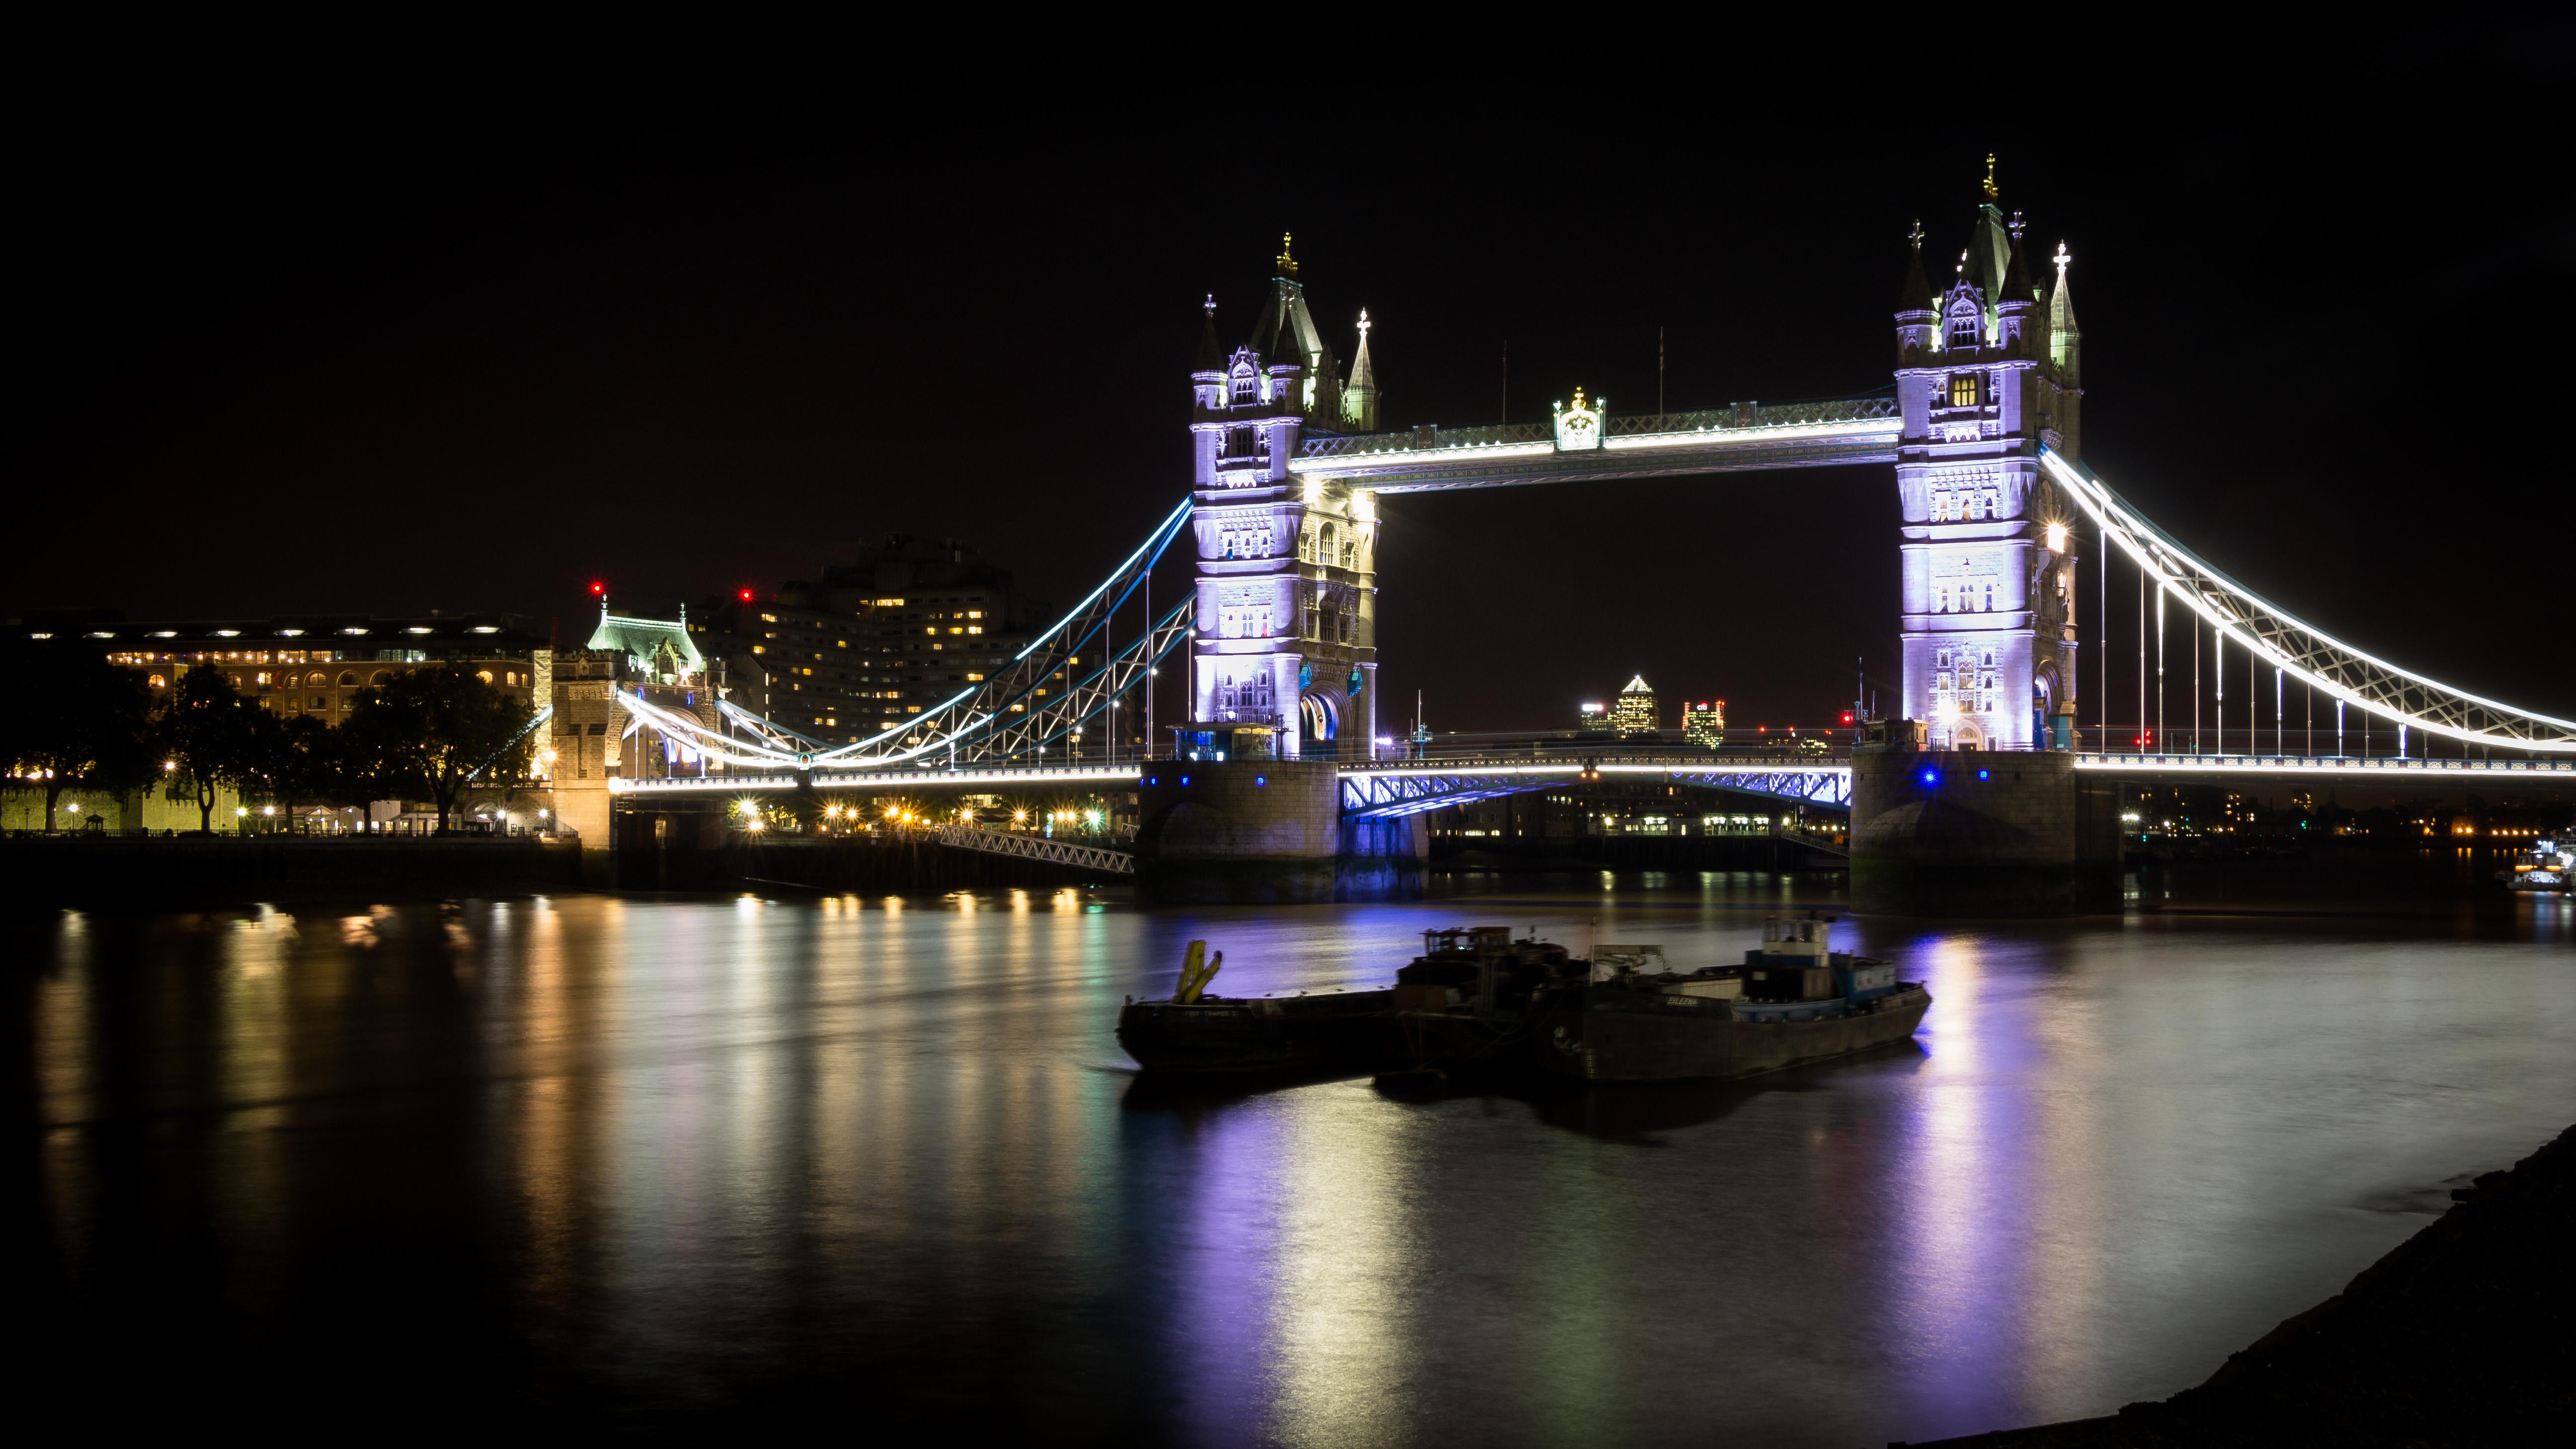 Paint Falling Wallpaper Tower Bridge